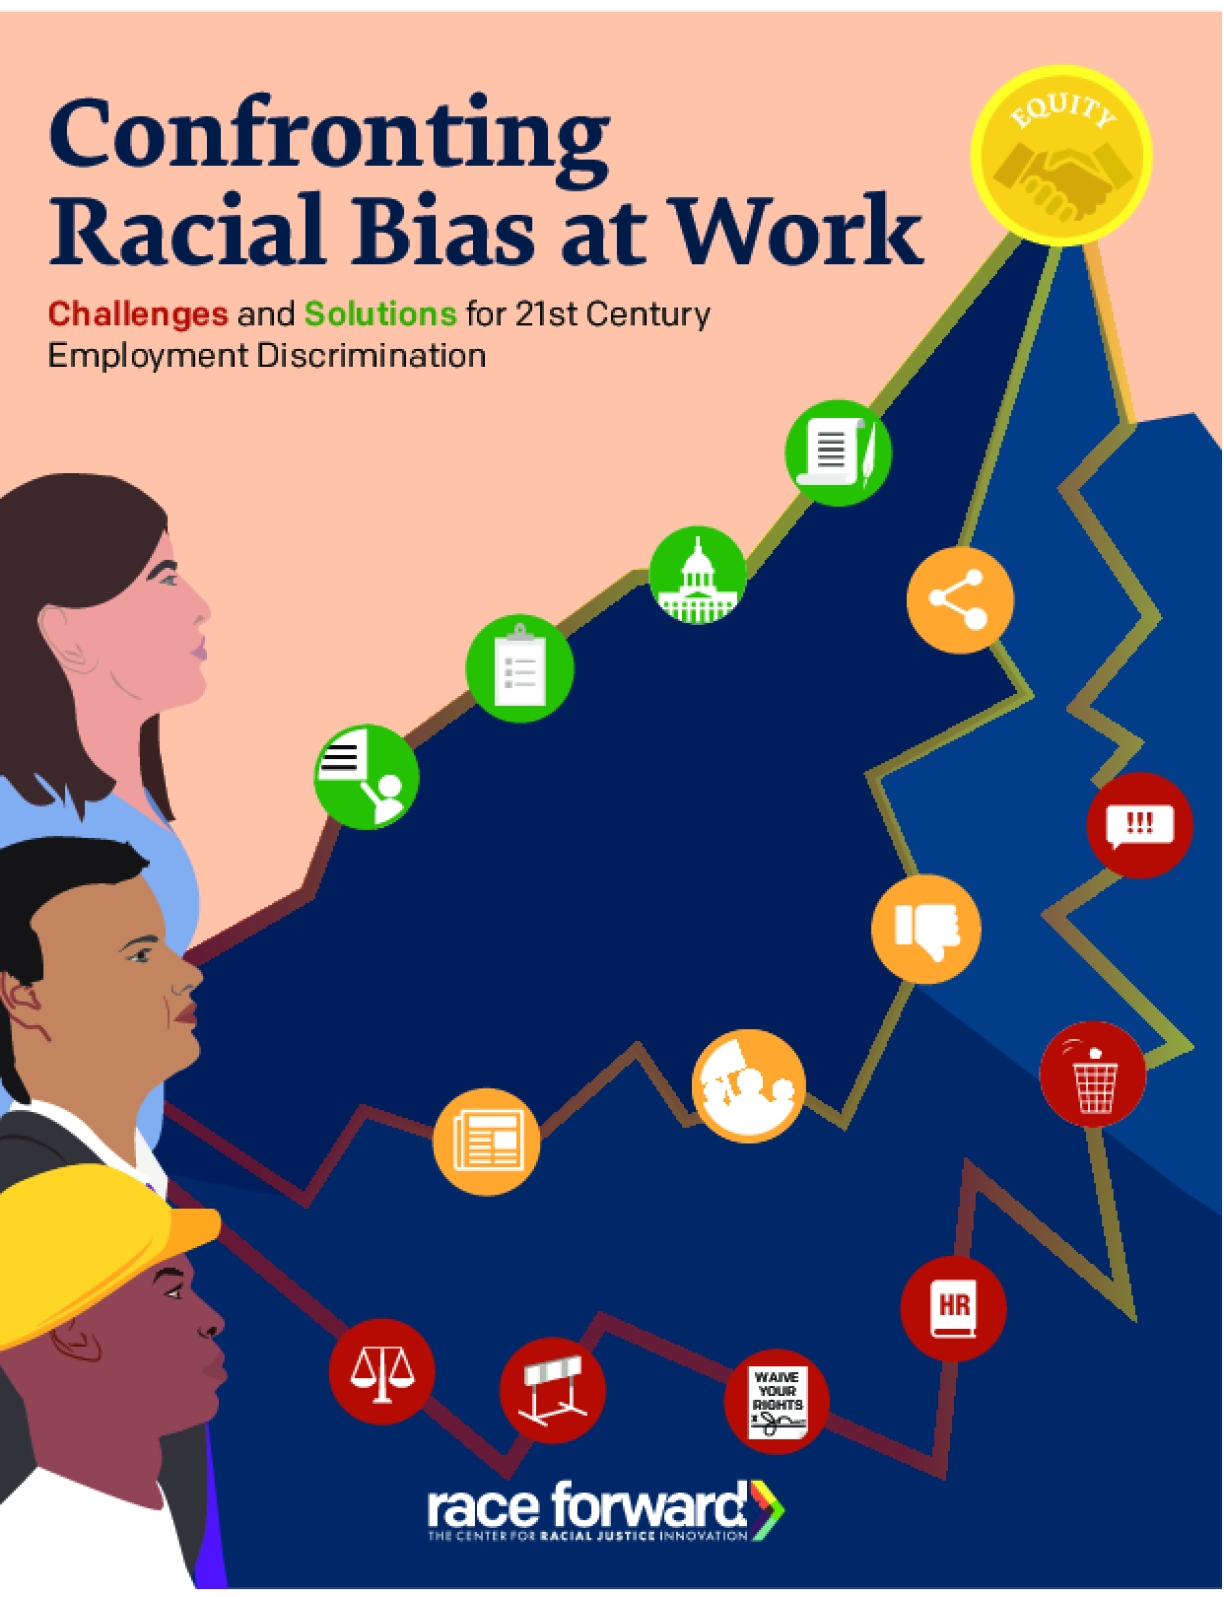 Confronting Racial Bias at Work